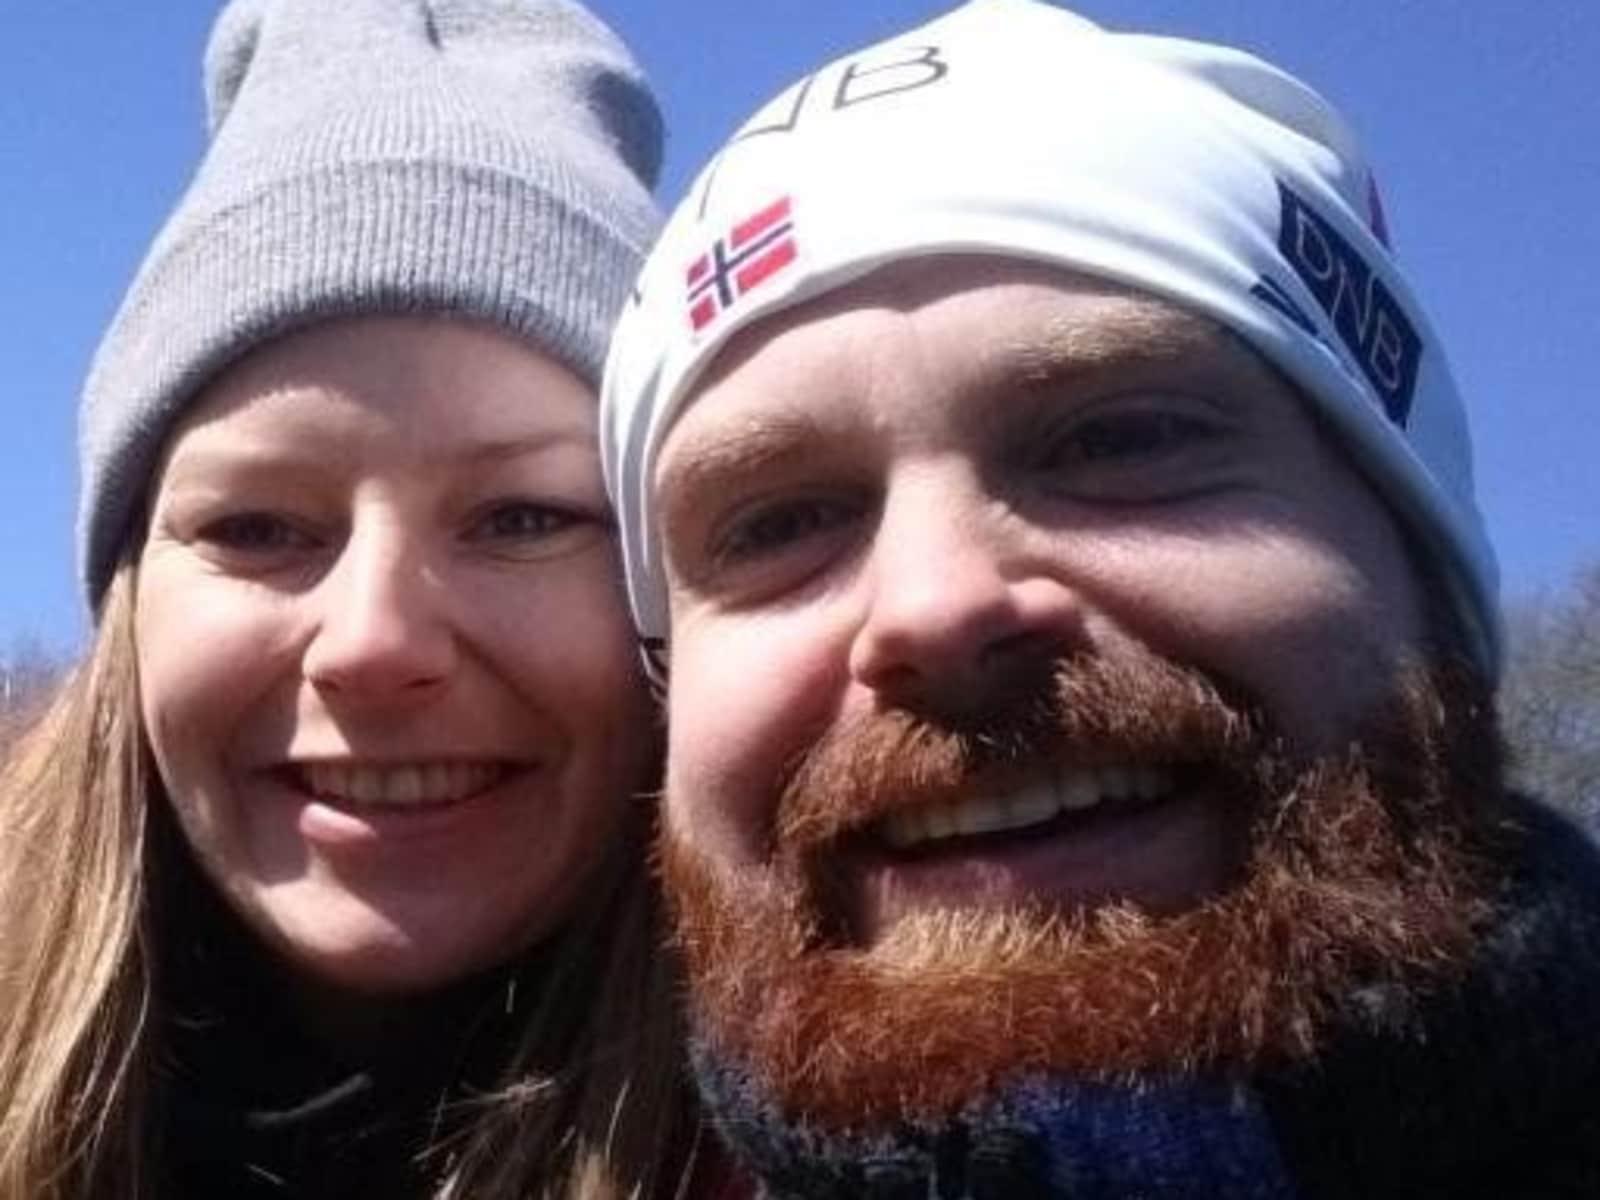 Anders & Marita from Vancouver, British Columbia, Canada